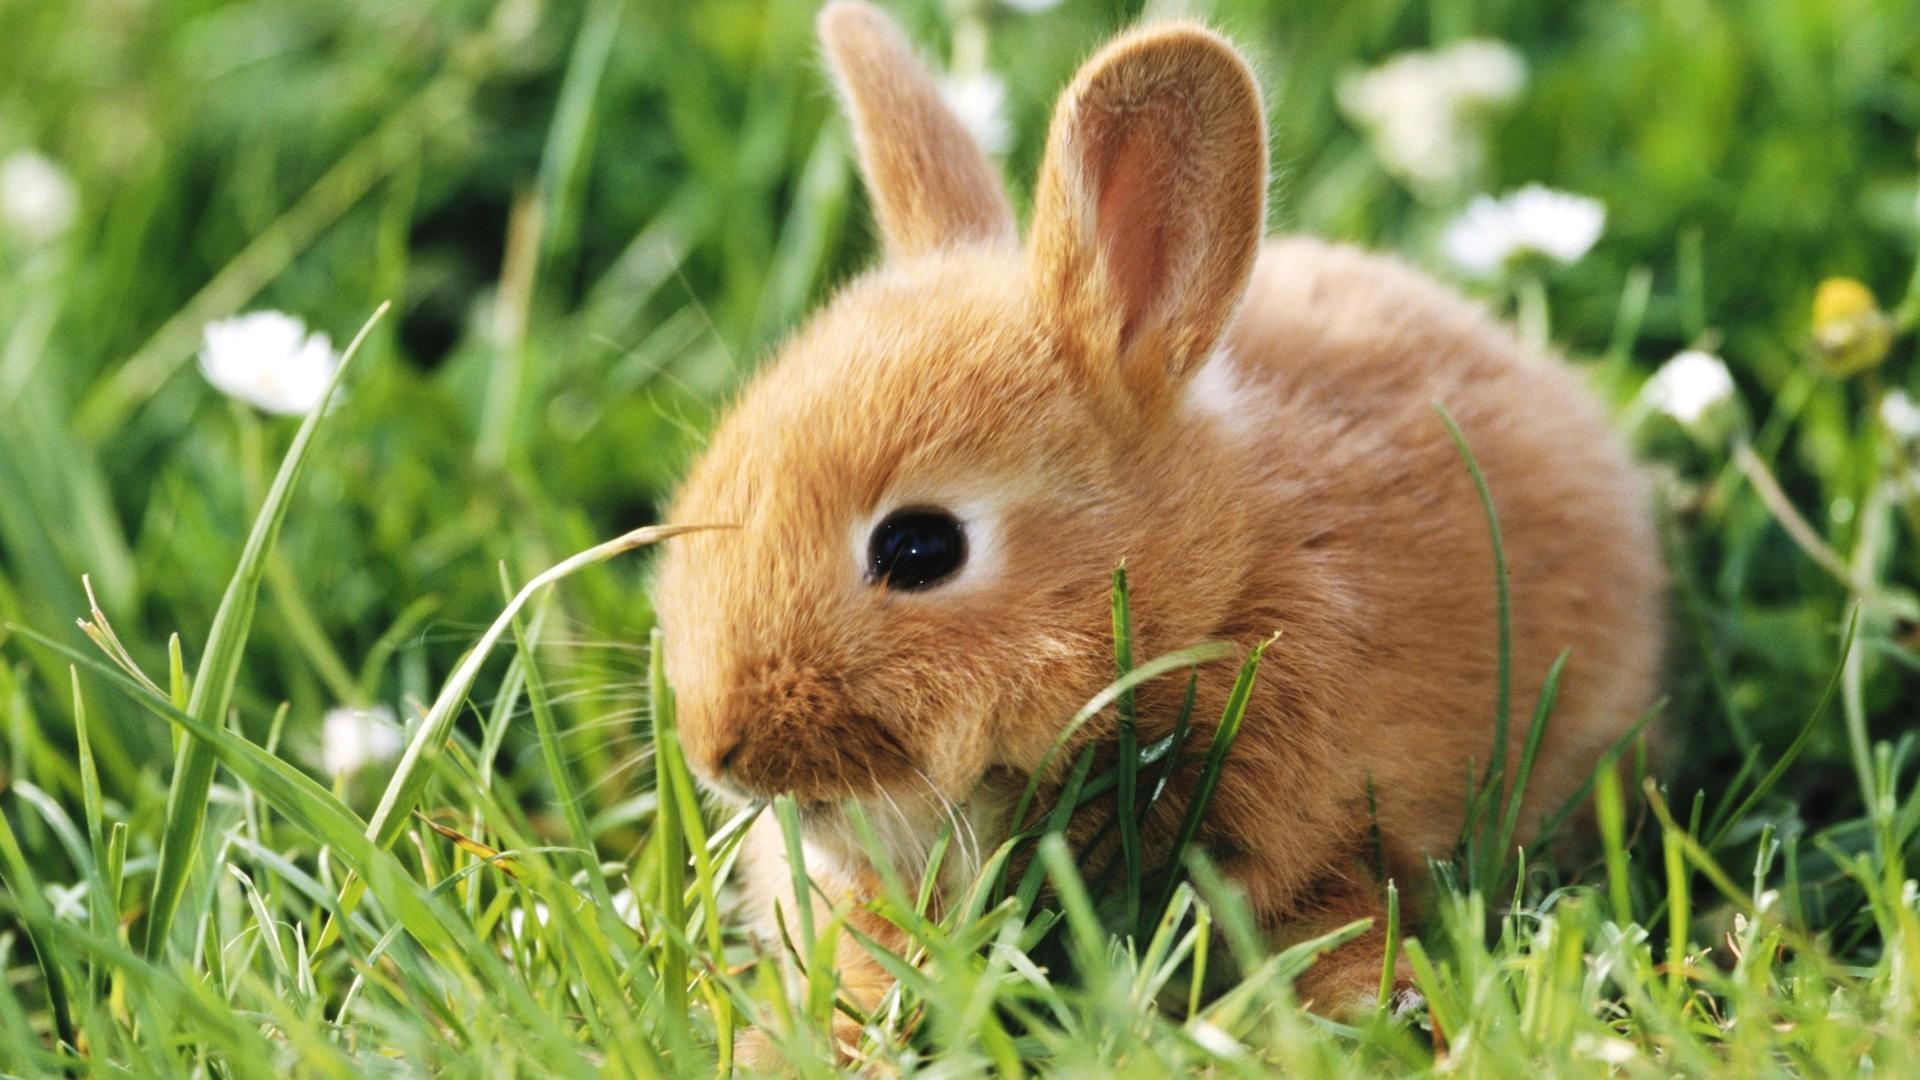 Cute Rabbit wallpaper photo hd